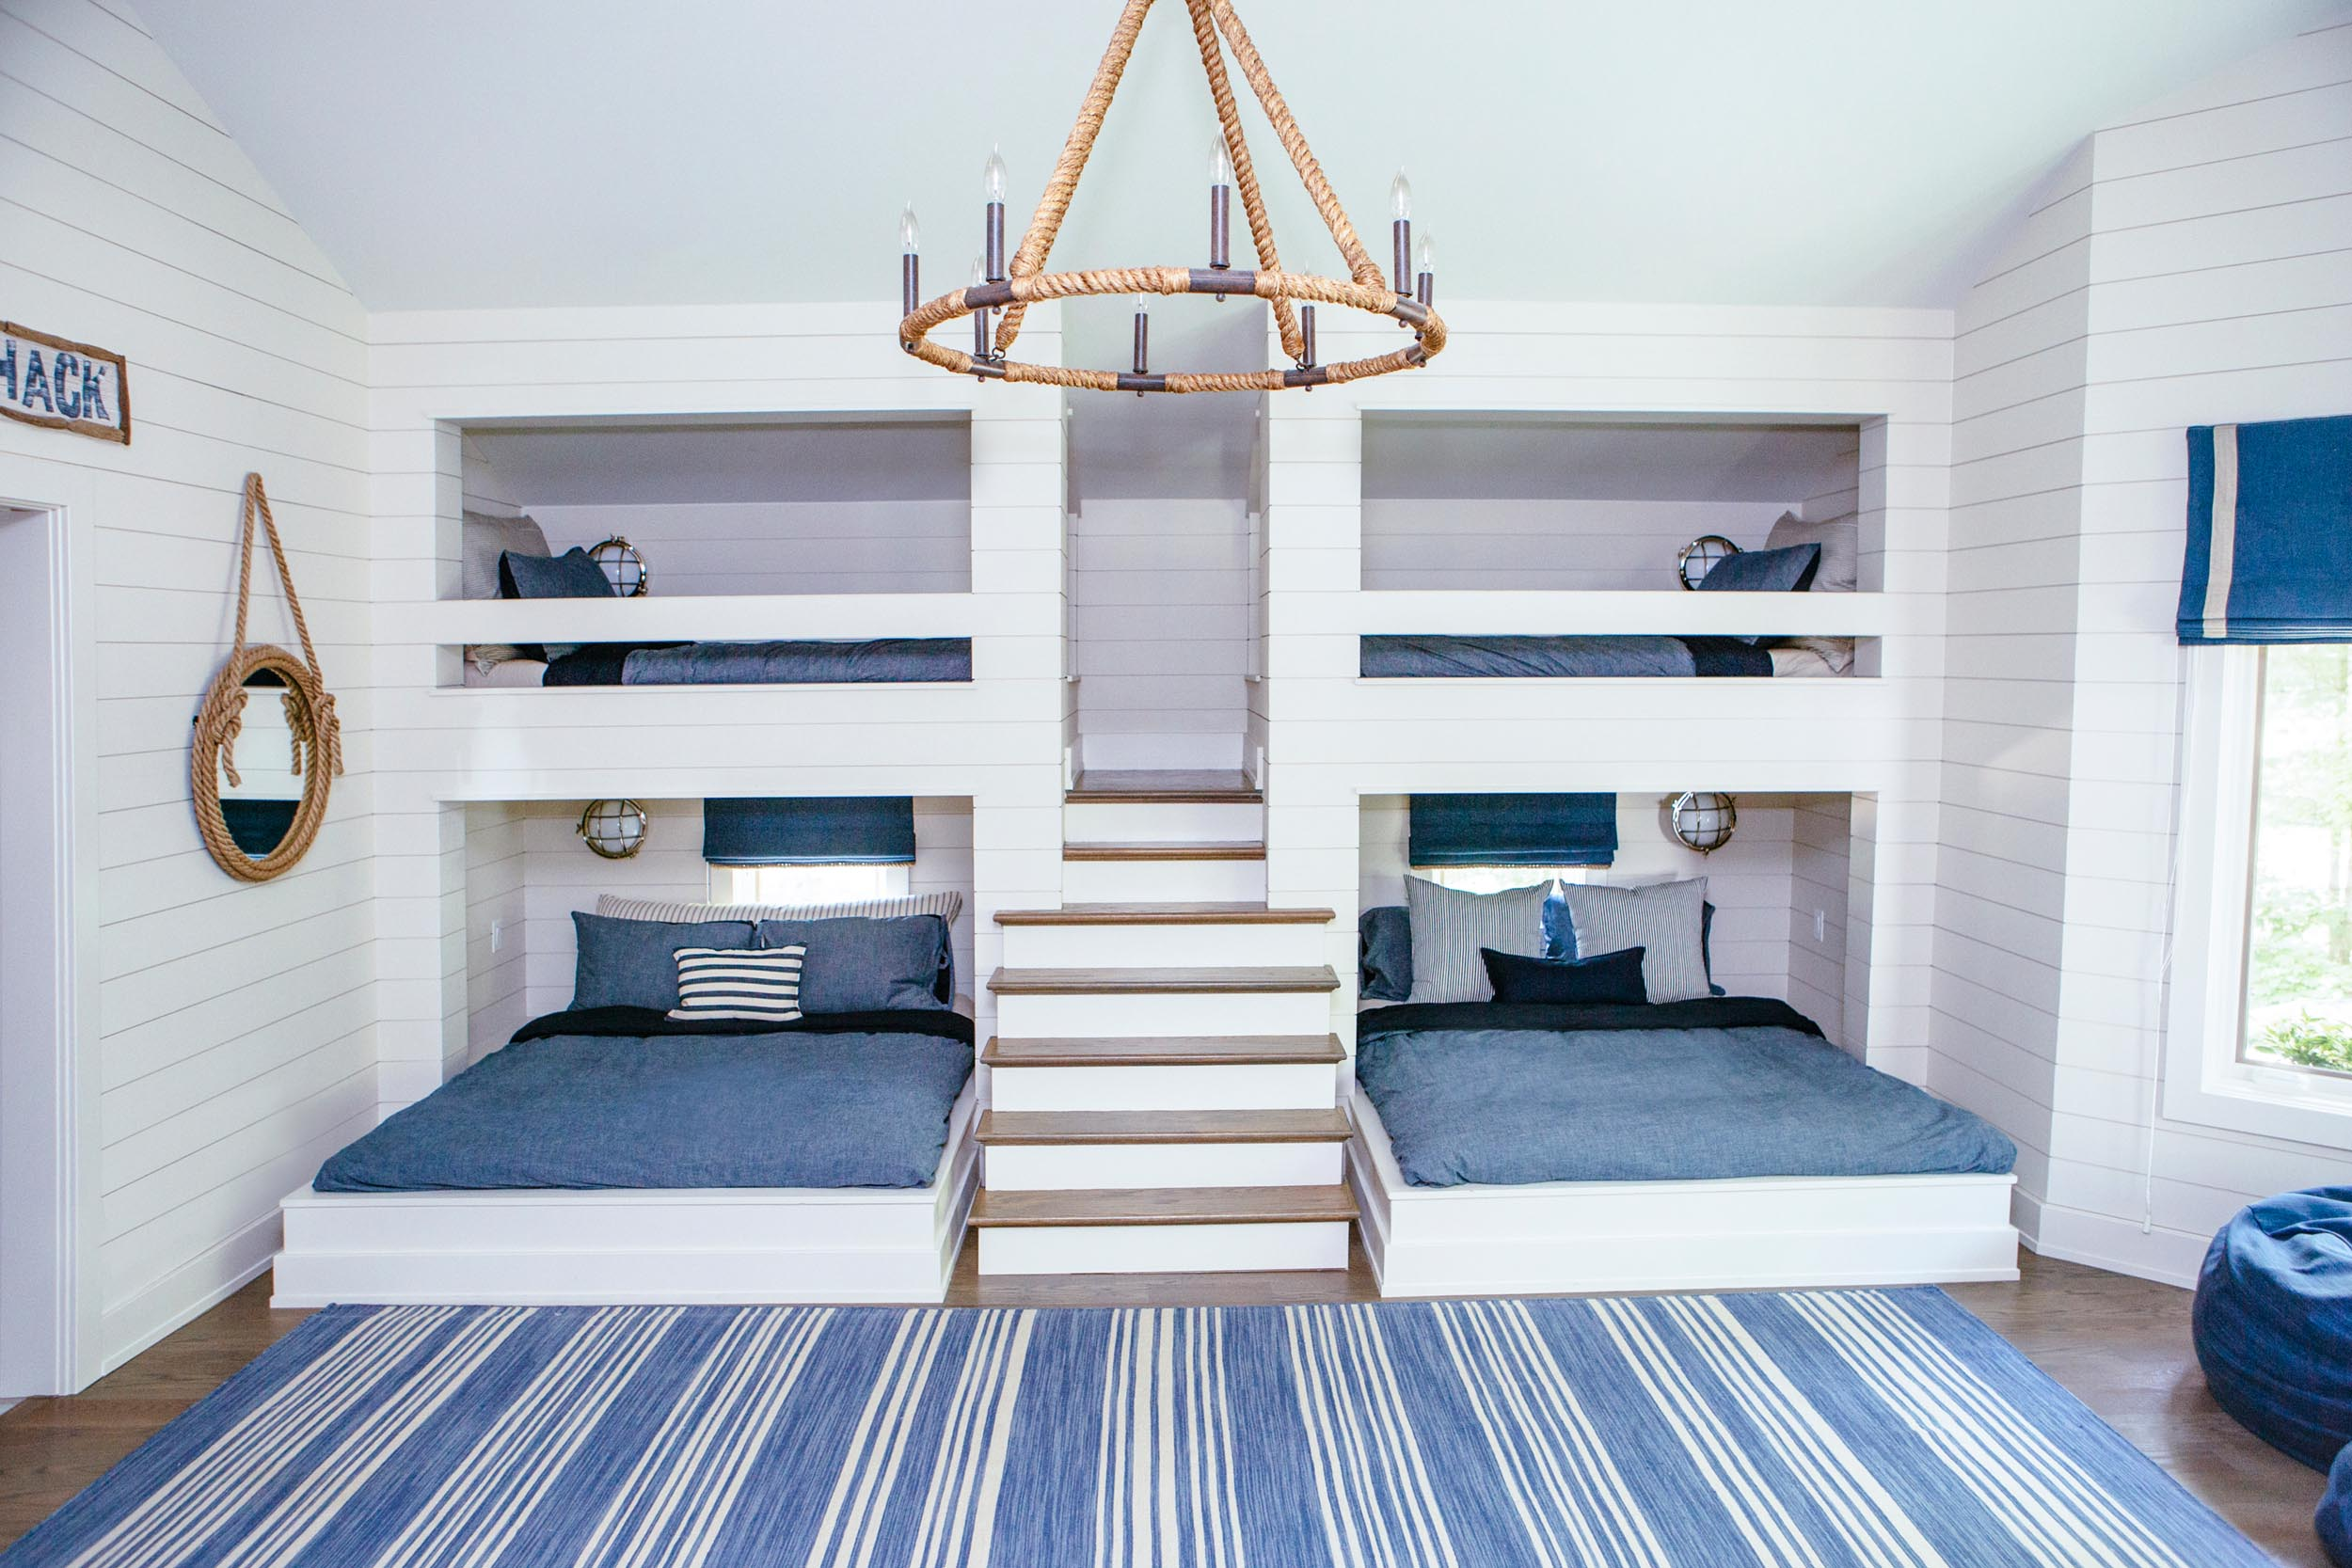 Leo_Designs_Chicago_interior_design_indigo_dreams_beach_house10.jpg